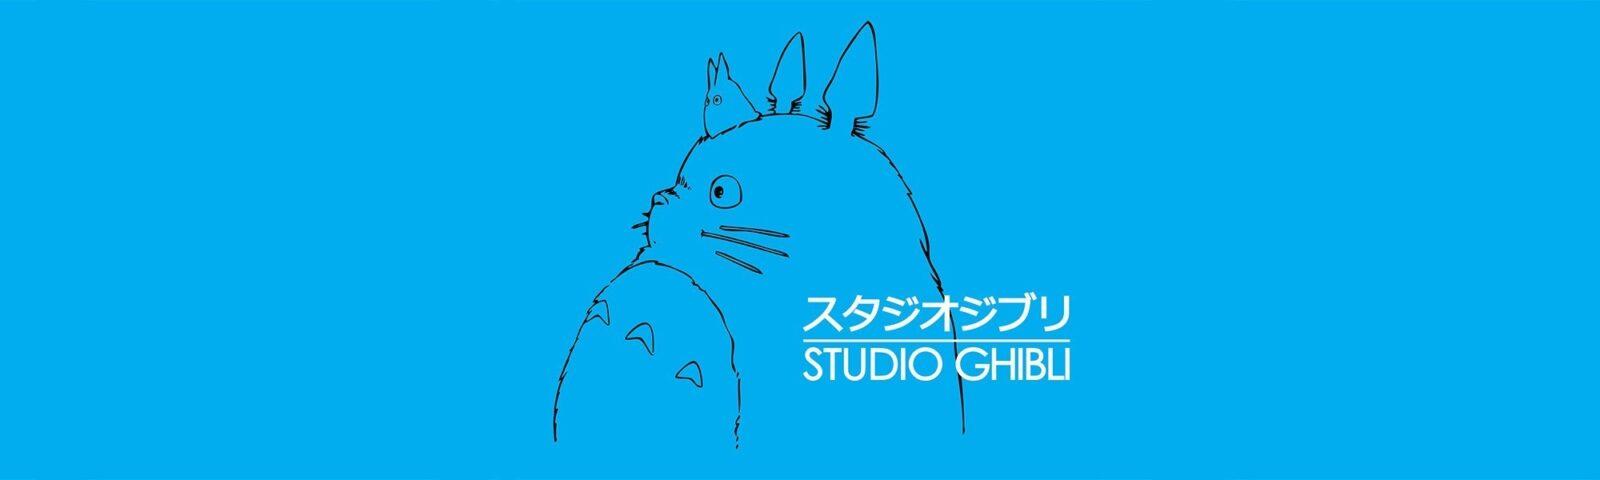 Studio Ghibli : Goro Miyazaki va réaliser un troisième film | LCDG